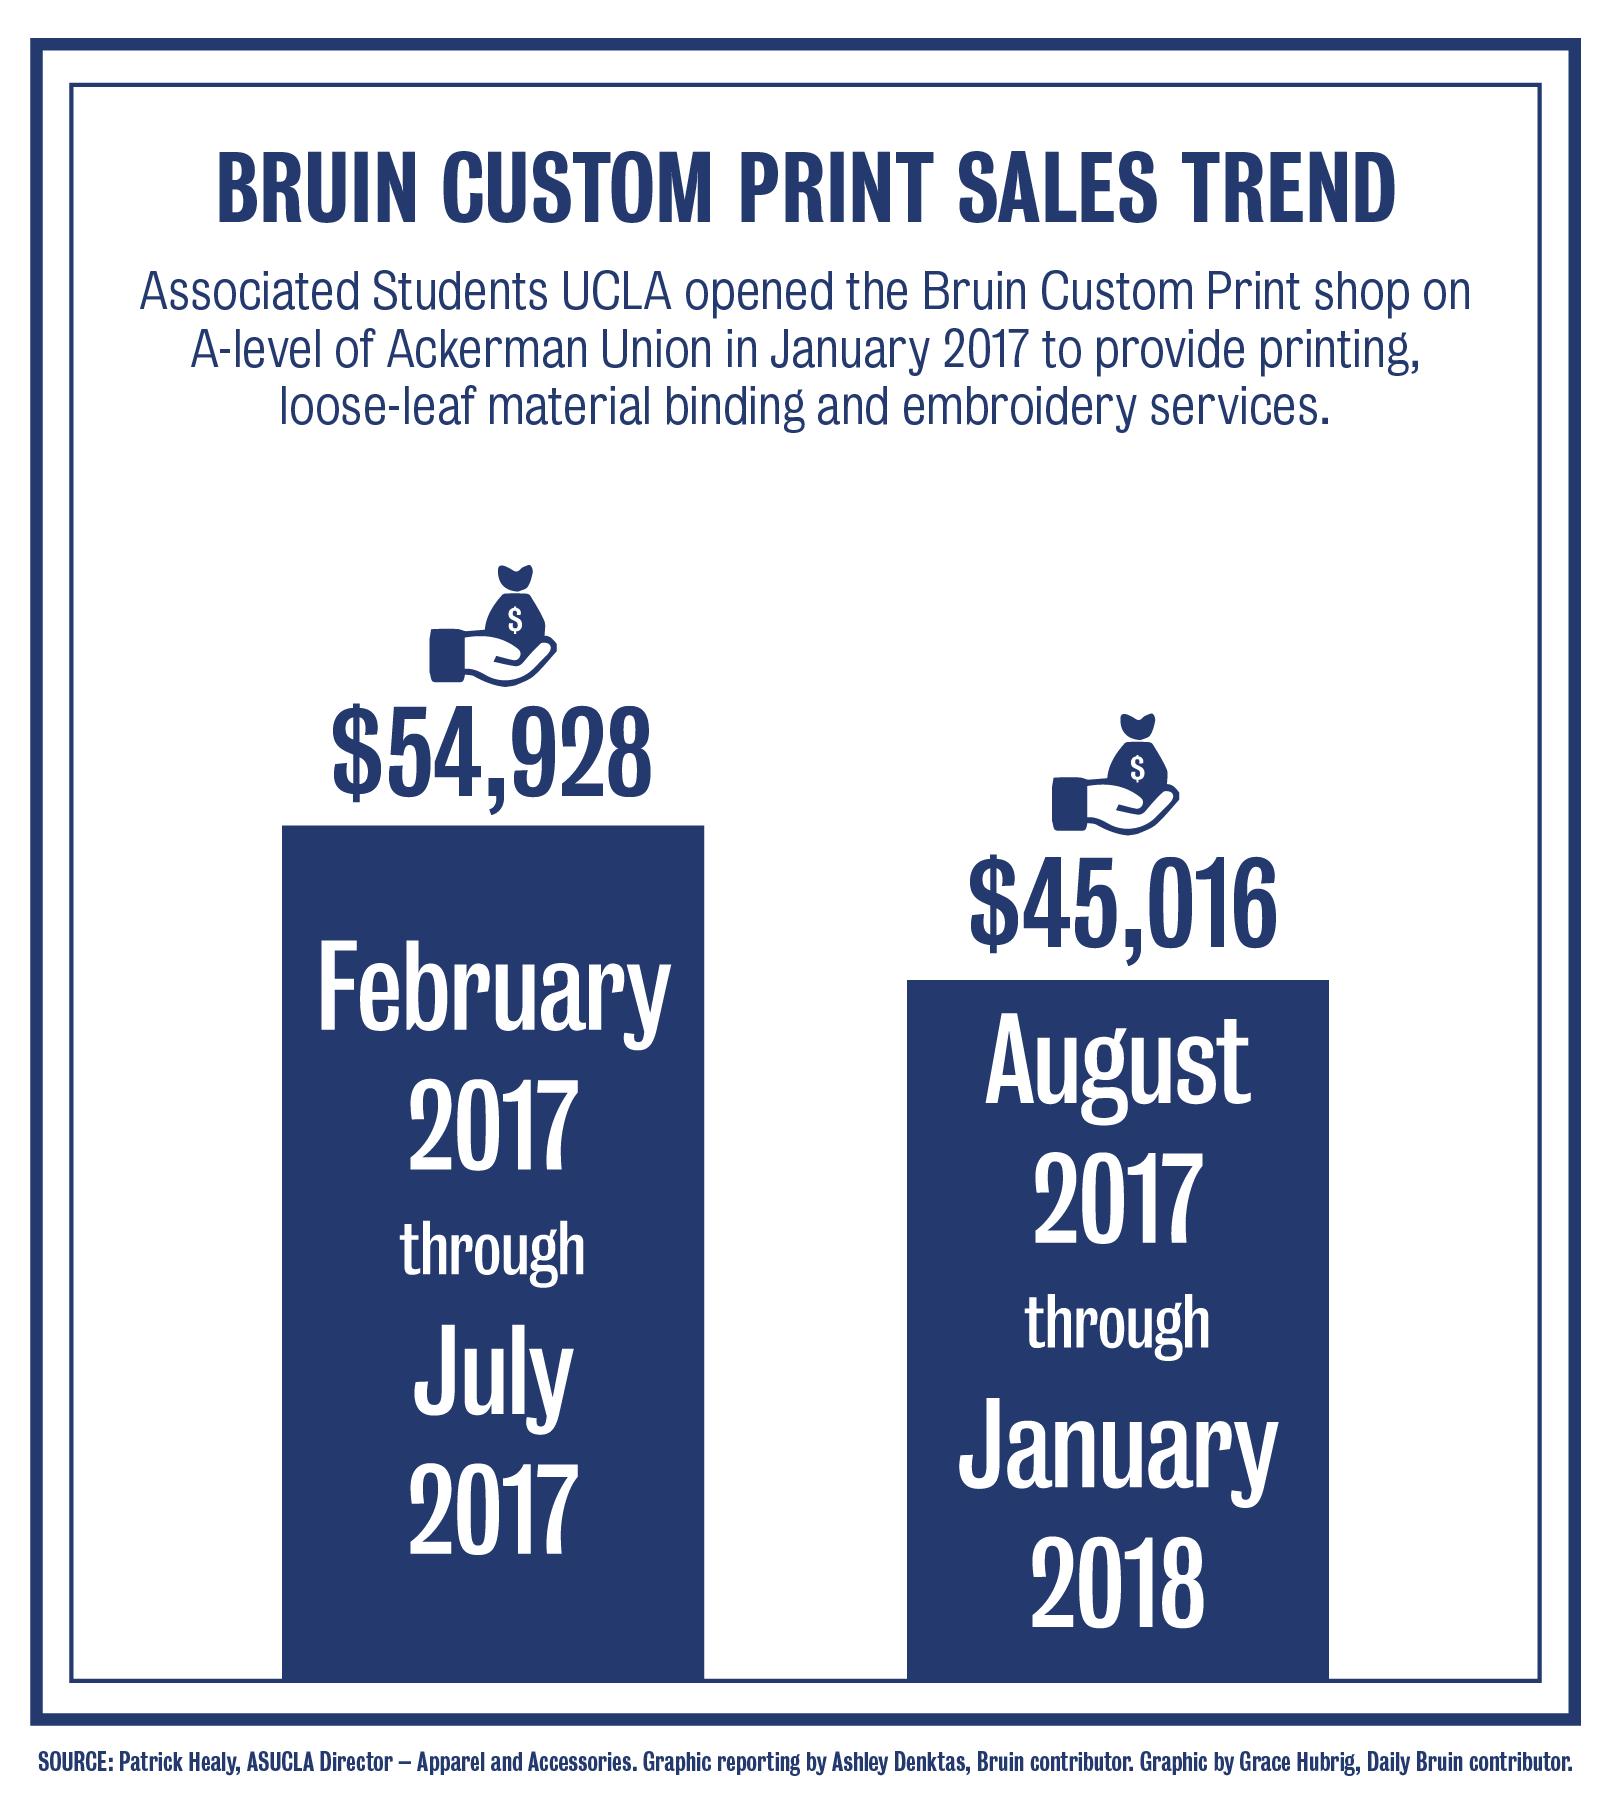 bruin custom print sees increase in